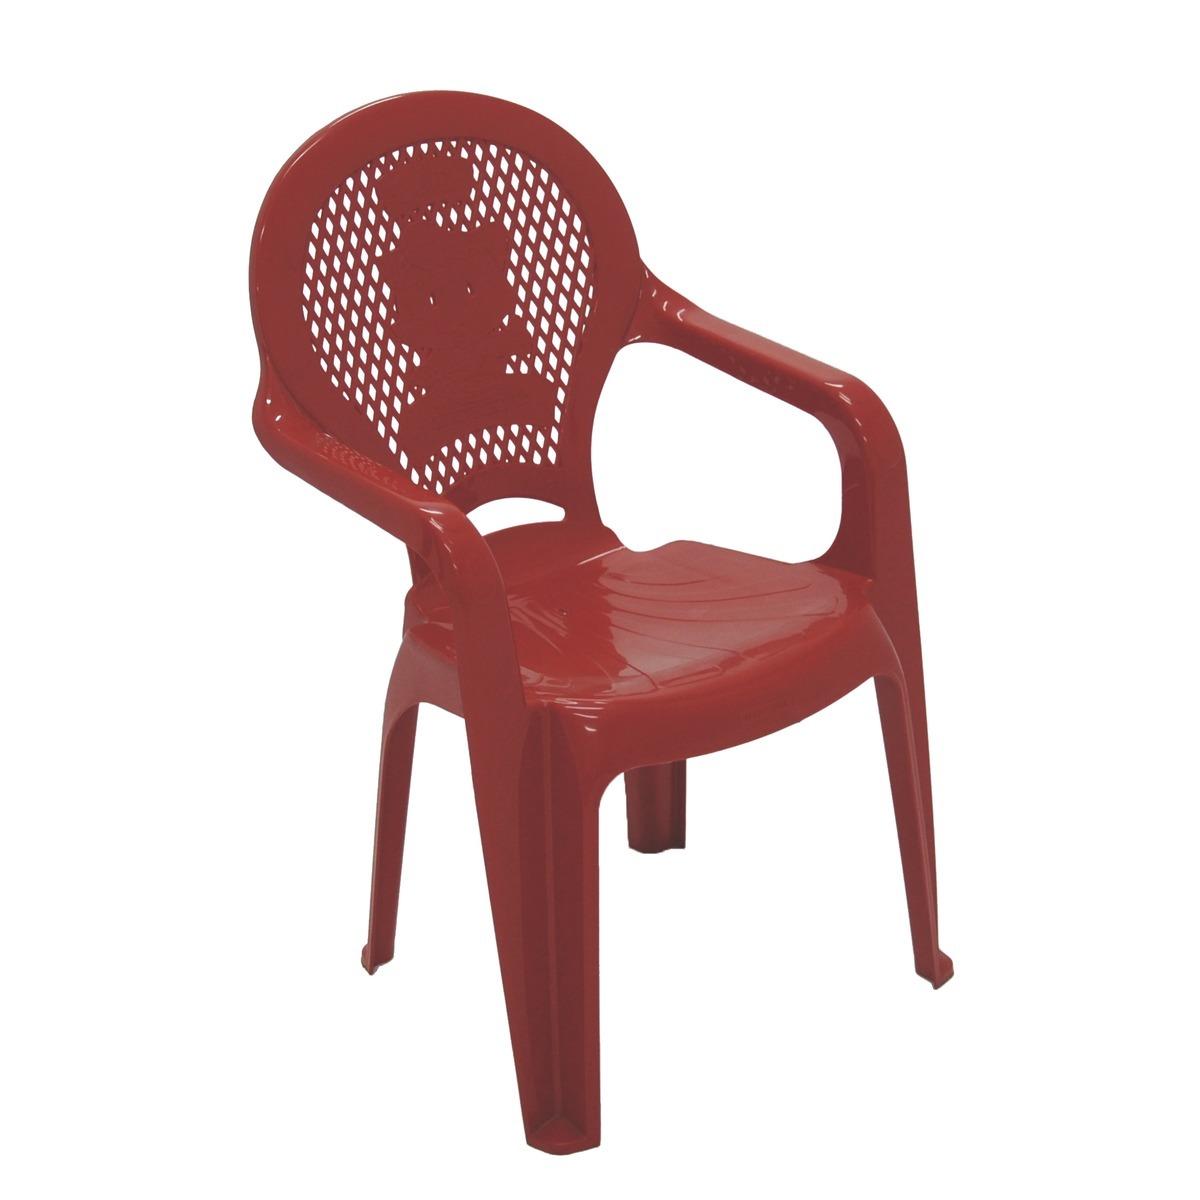 Poltrona Infantil de Plastico Estampada Vermelha 92264040 - Tramontina